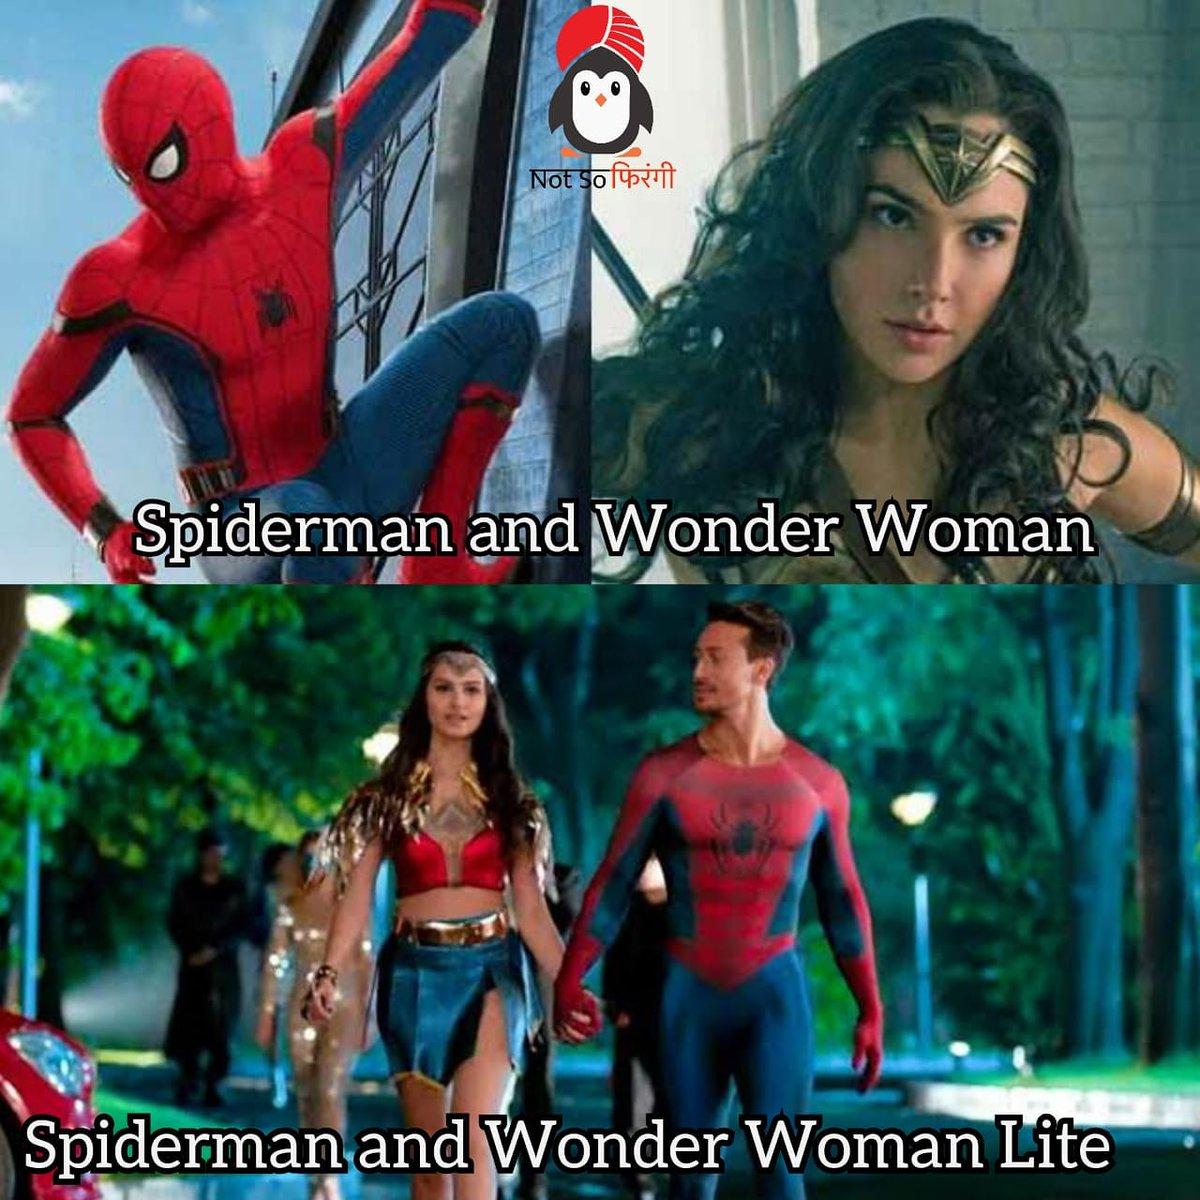 #notsofirangi #spiderman #WonderWoman #dccomics #AvengersEndgame #AvengersInfinityWar #DCUNIVERSE #memesdaily #IndiaFightsCorona #Funniestmemes #FunniestTweets #bollywood #NepotismEndsin2020 #NepotismBollywoodpic.twitter.com/qfCLdNrE6t